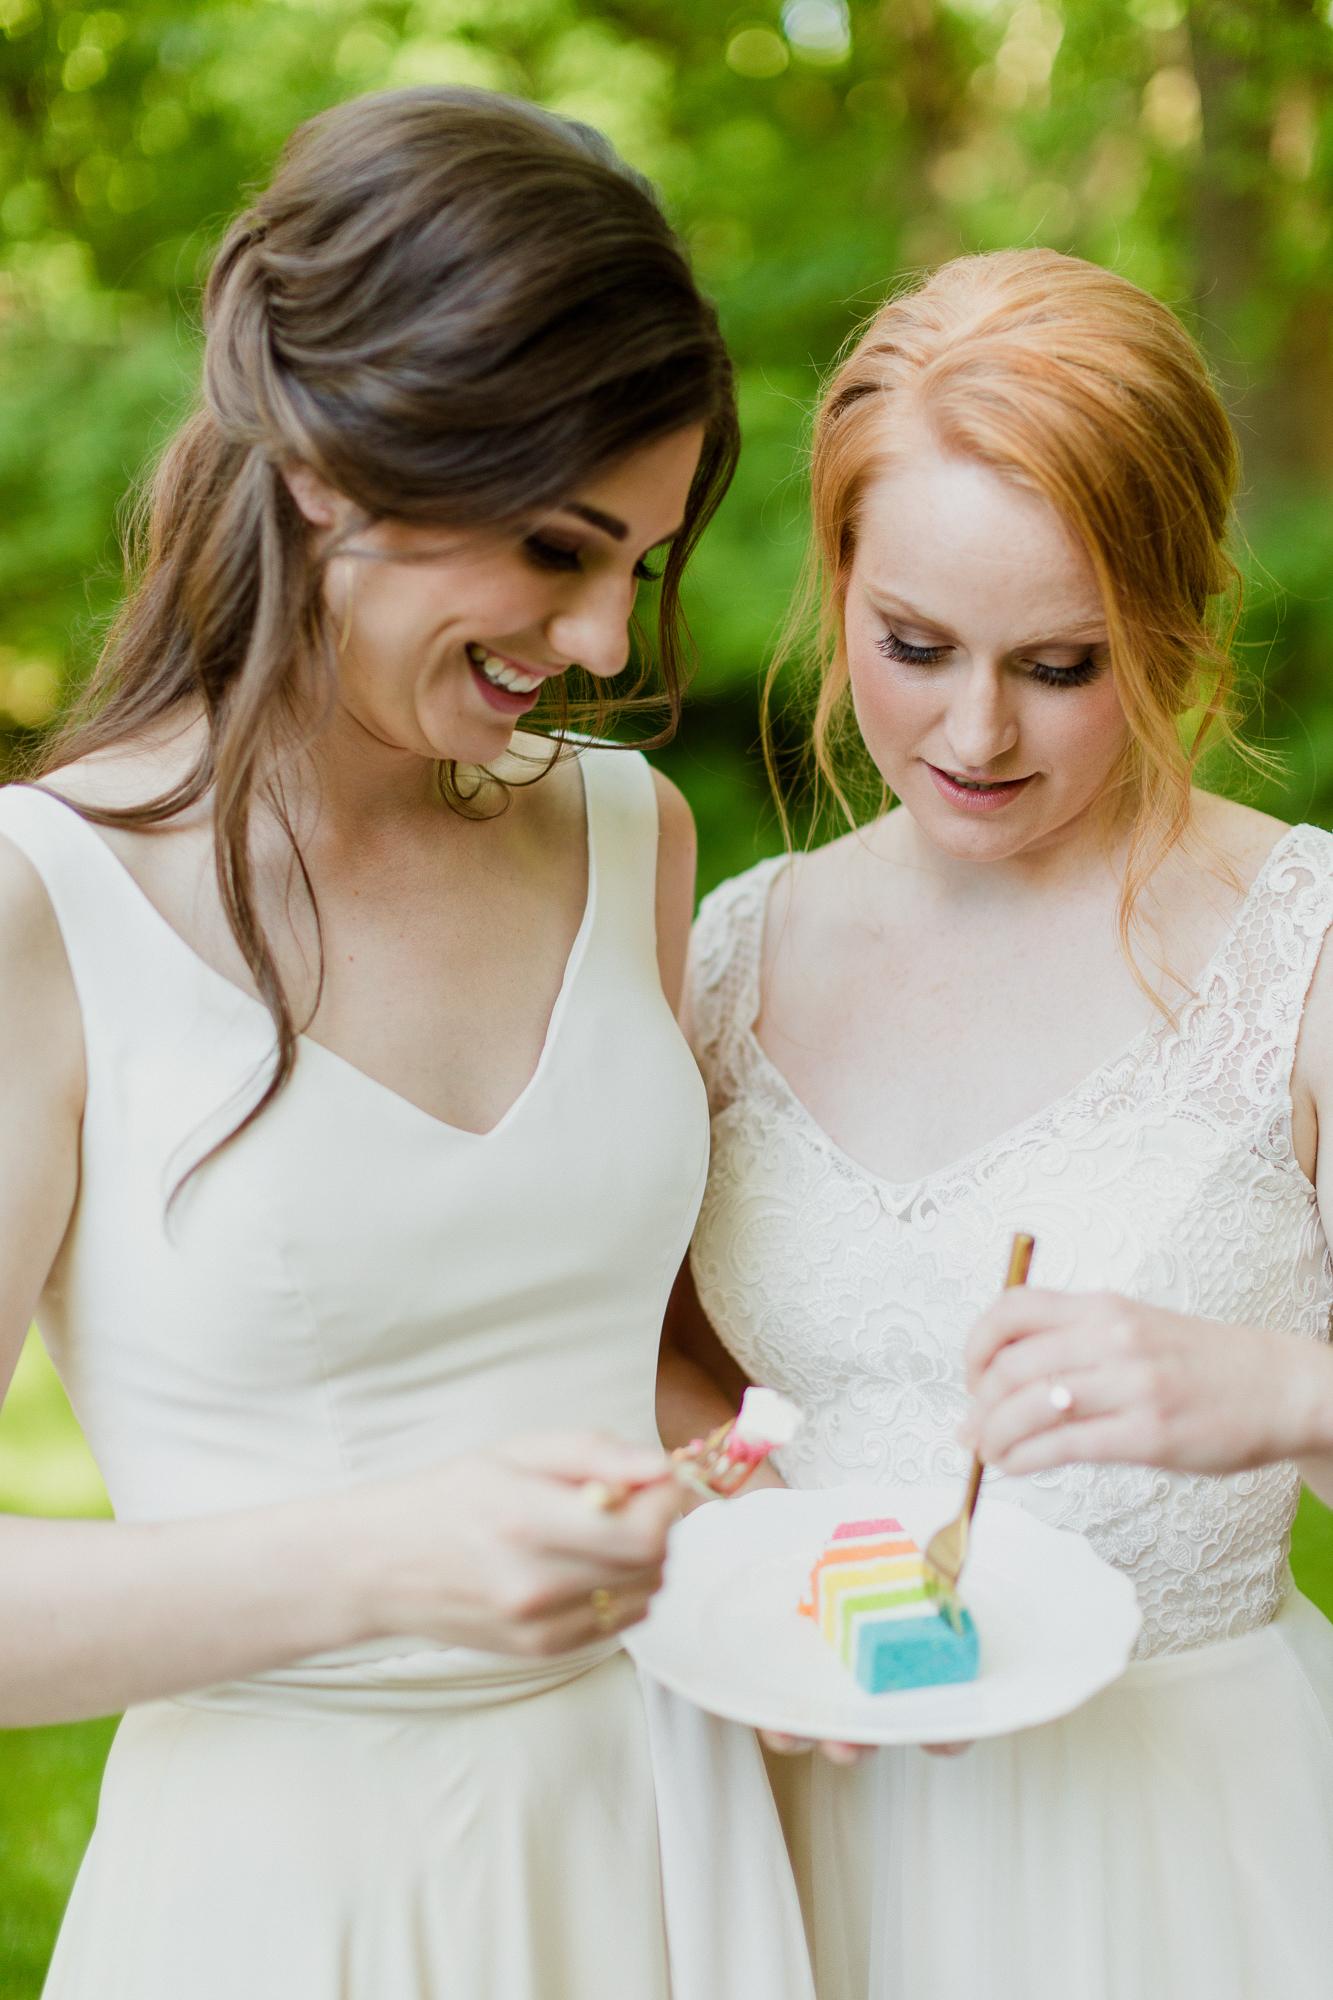 Minneapolis Wedding Shop | Queer Friendly | Bridal Shop